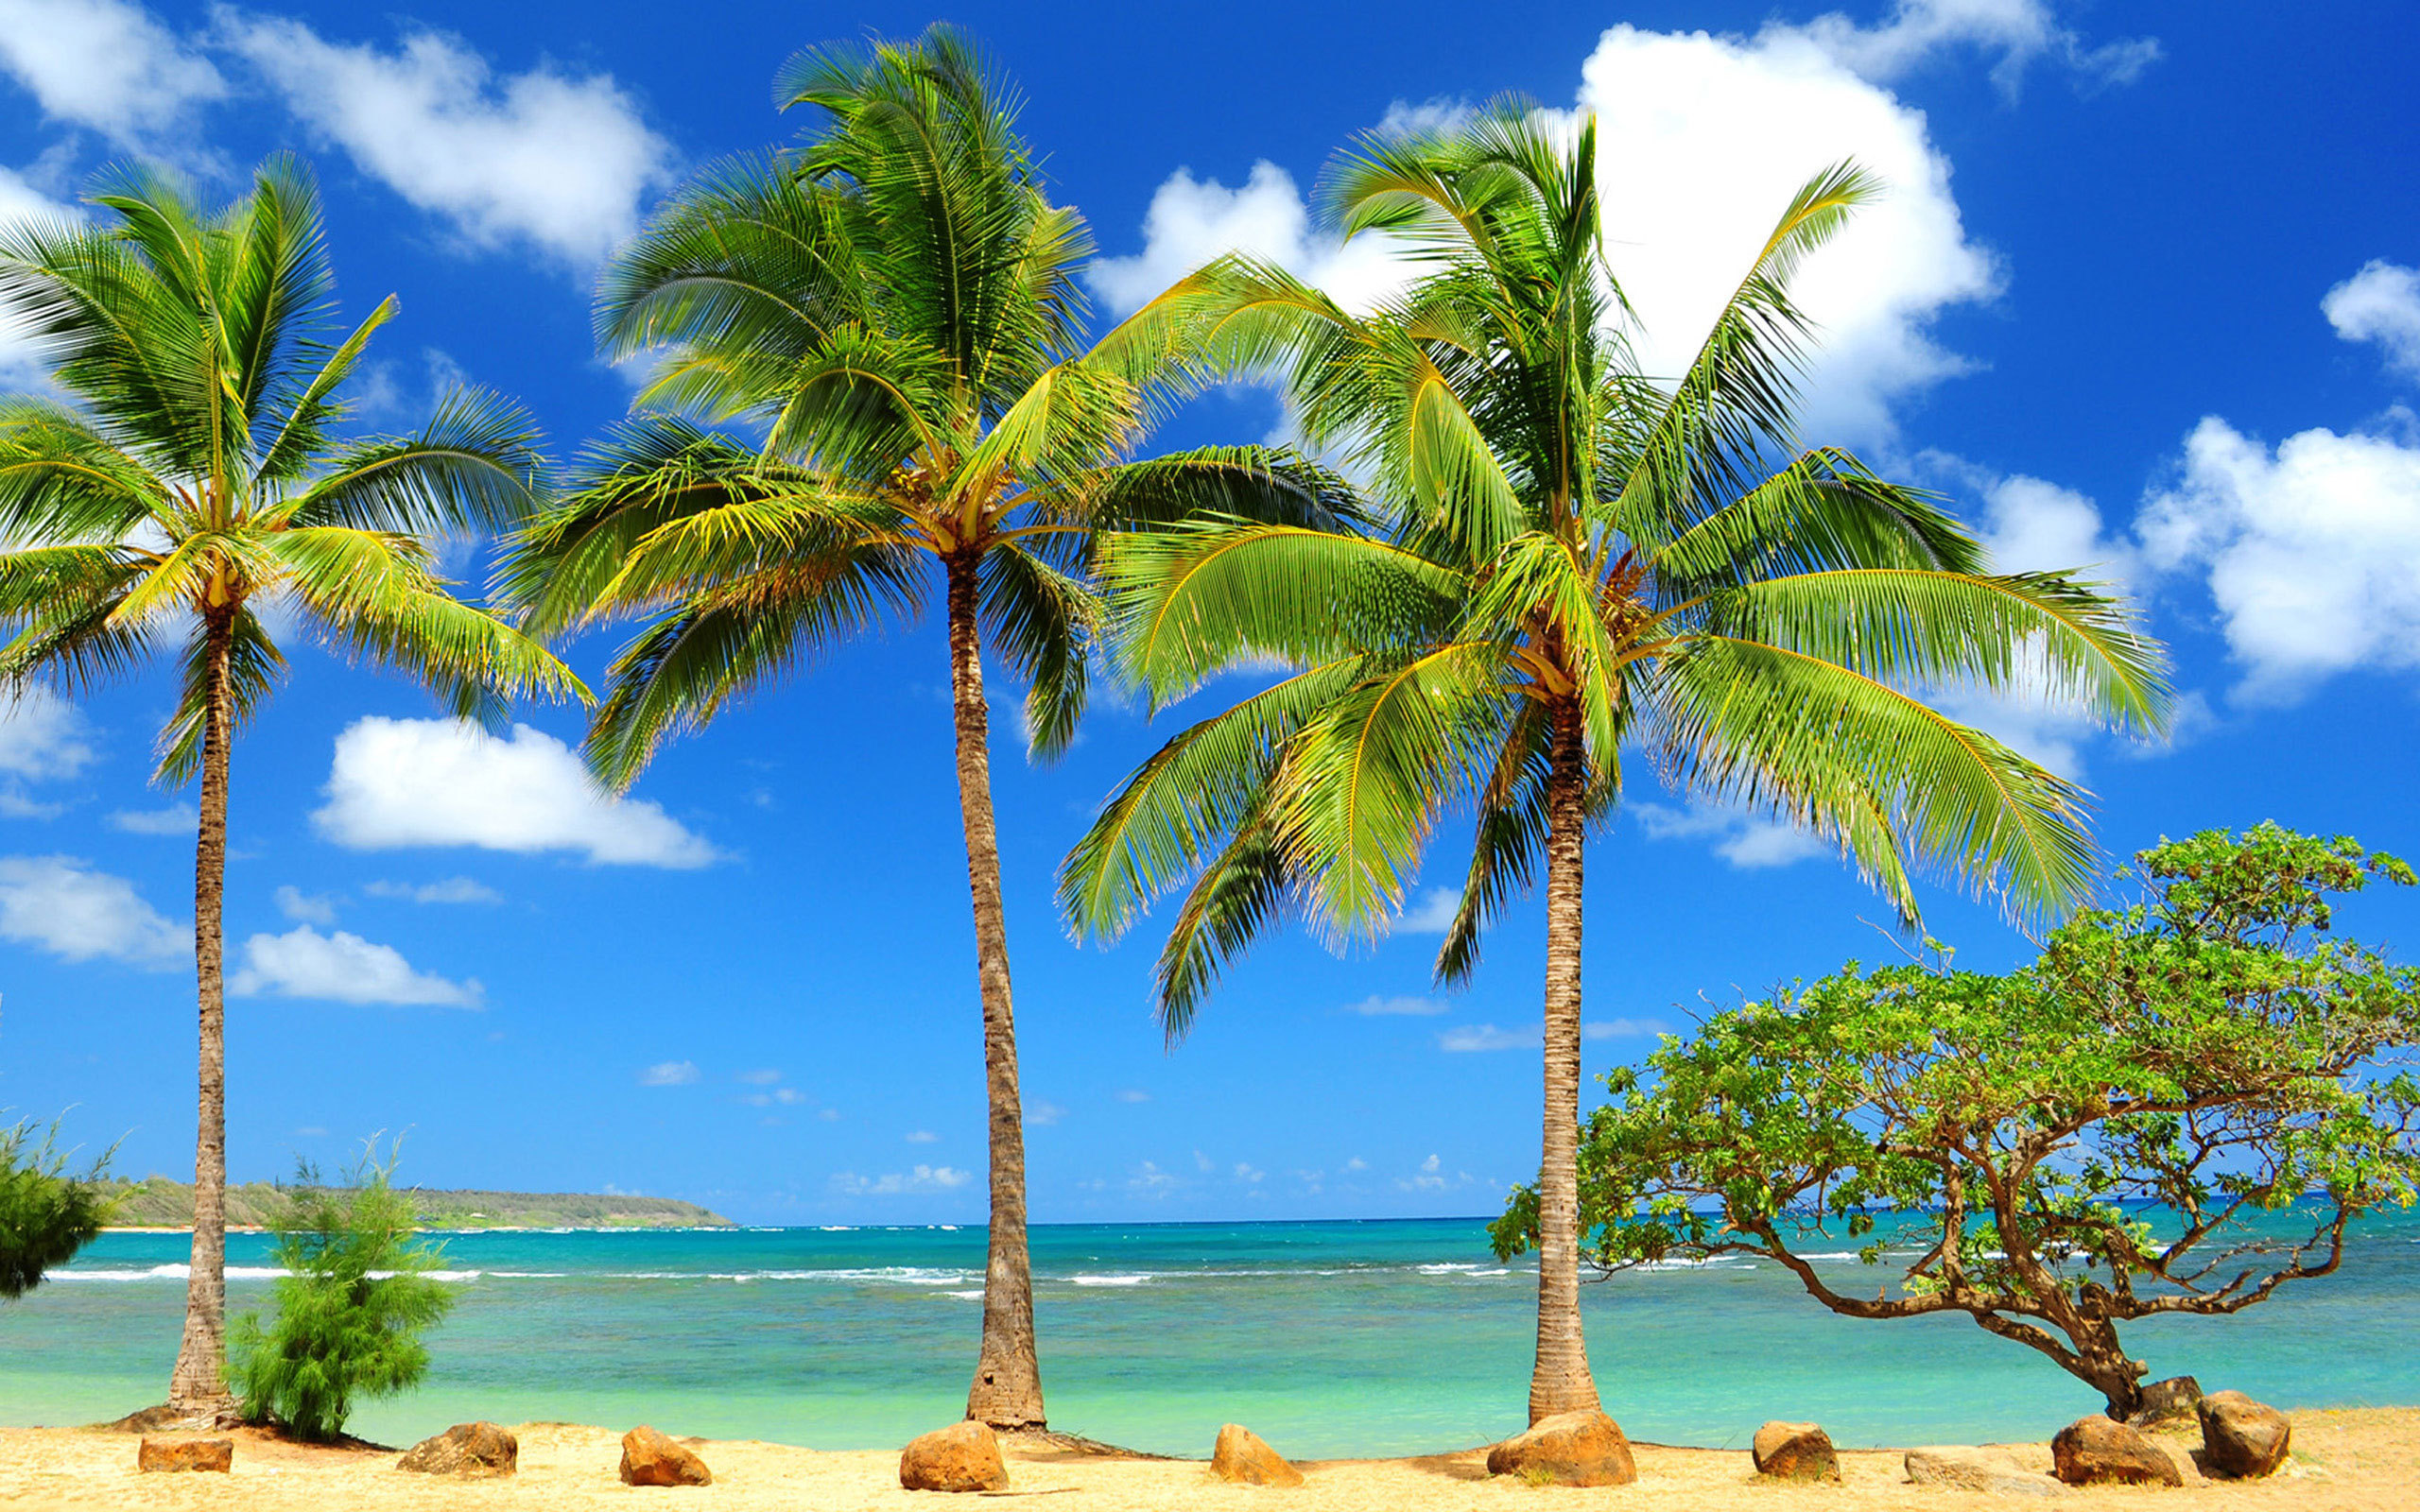 hd wallpapers palm trees desktop wallpaper